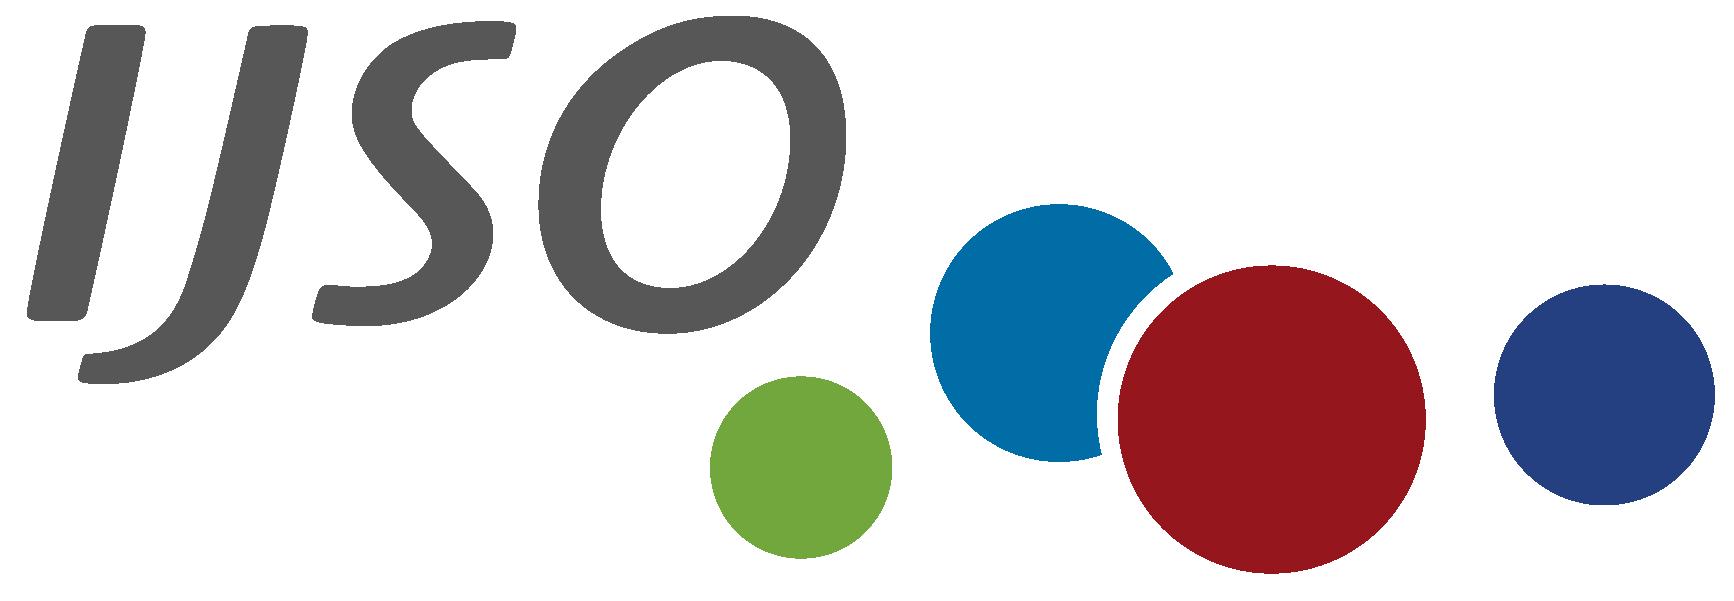 Digitale Abschlussveranstaltung zur Internationalen JuniorScienceOlympiade 2020